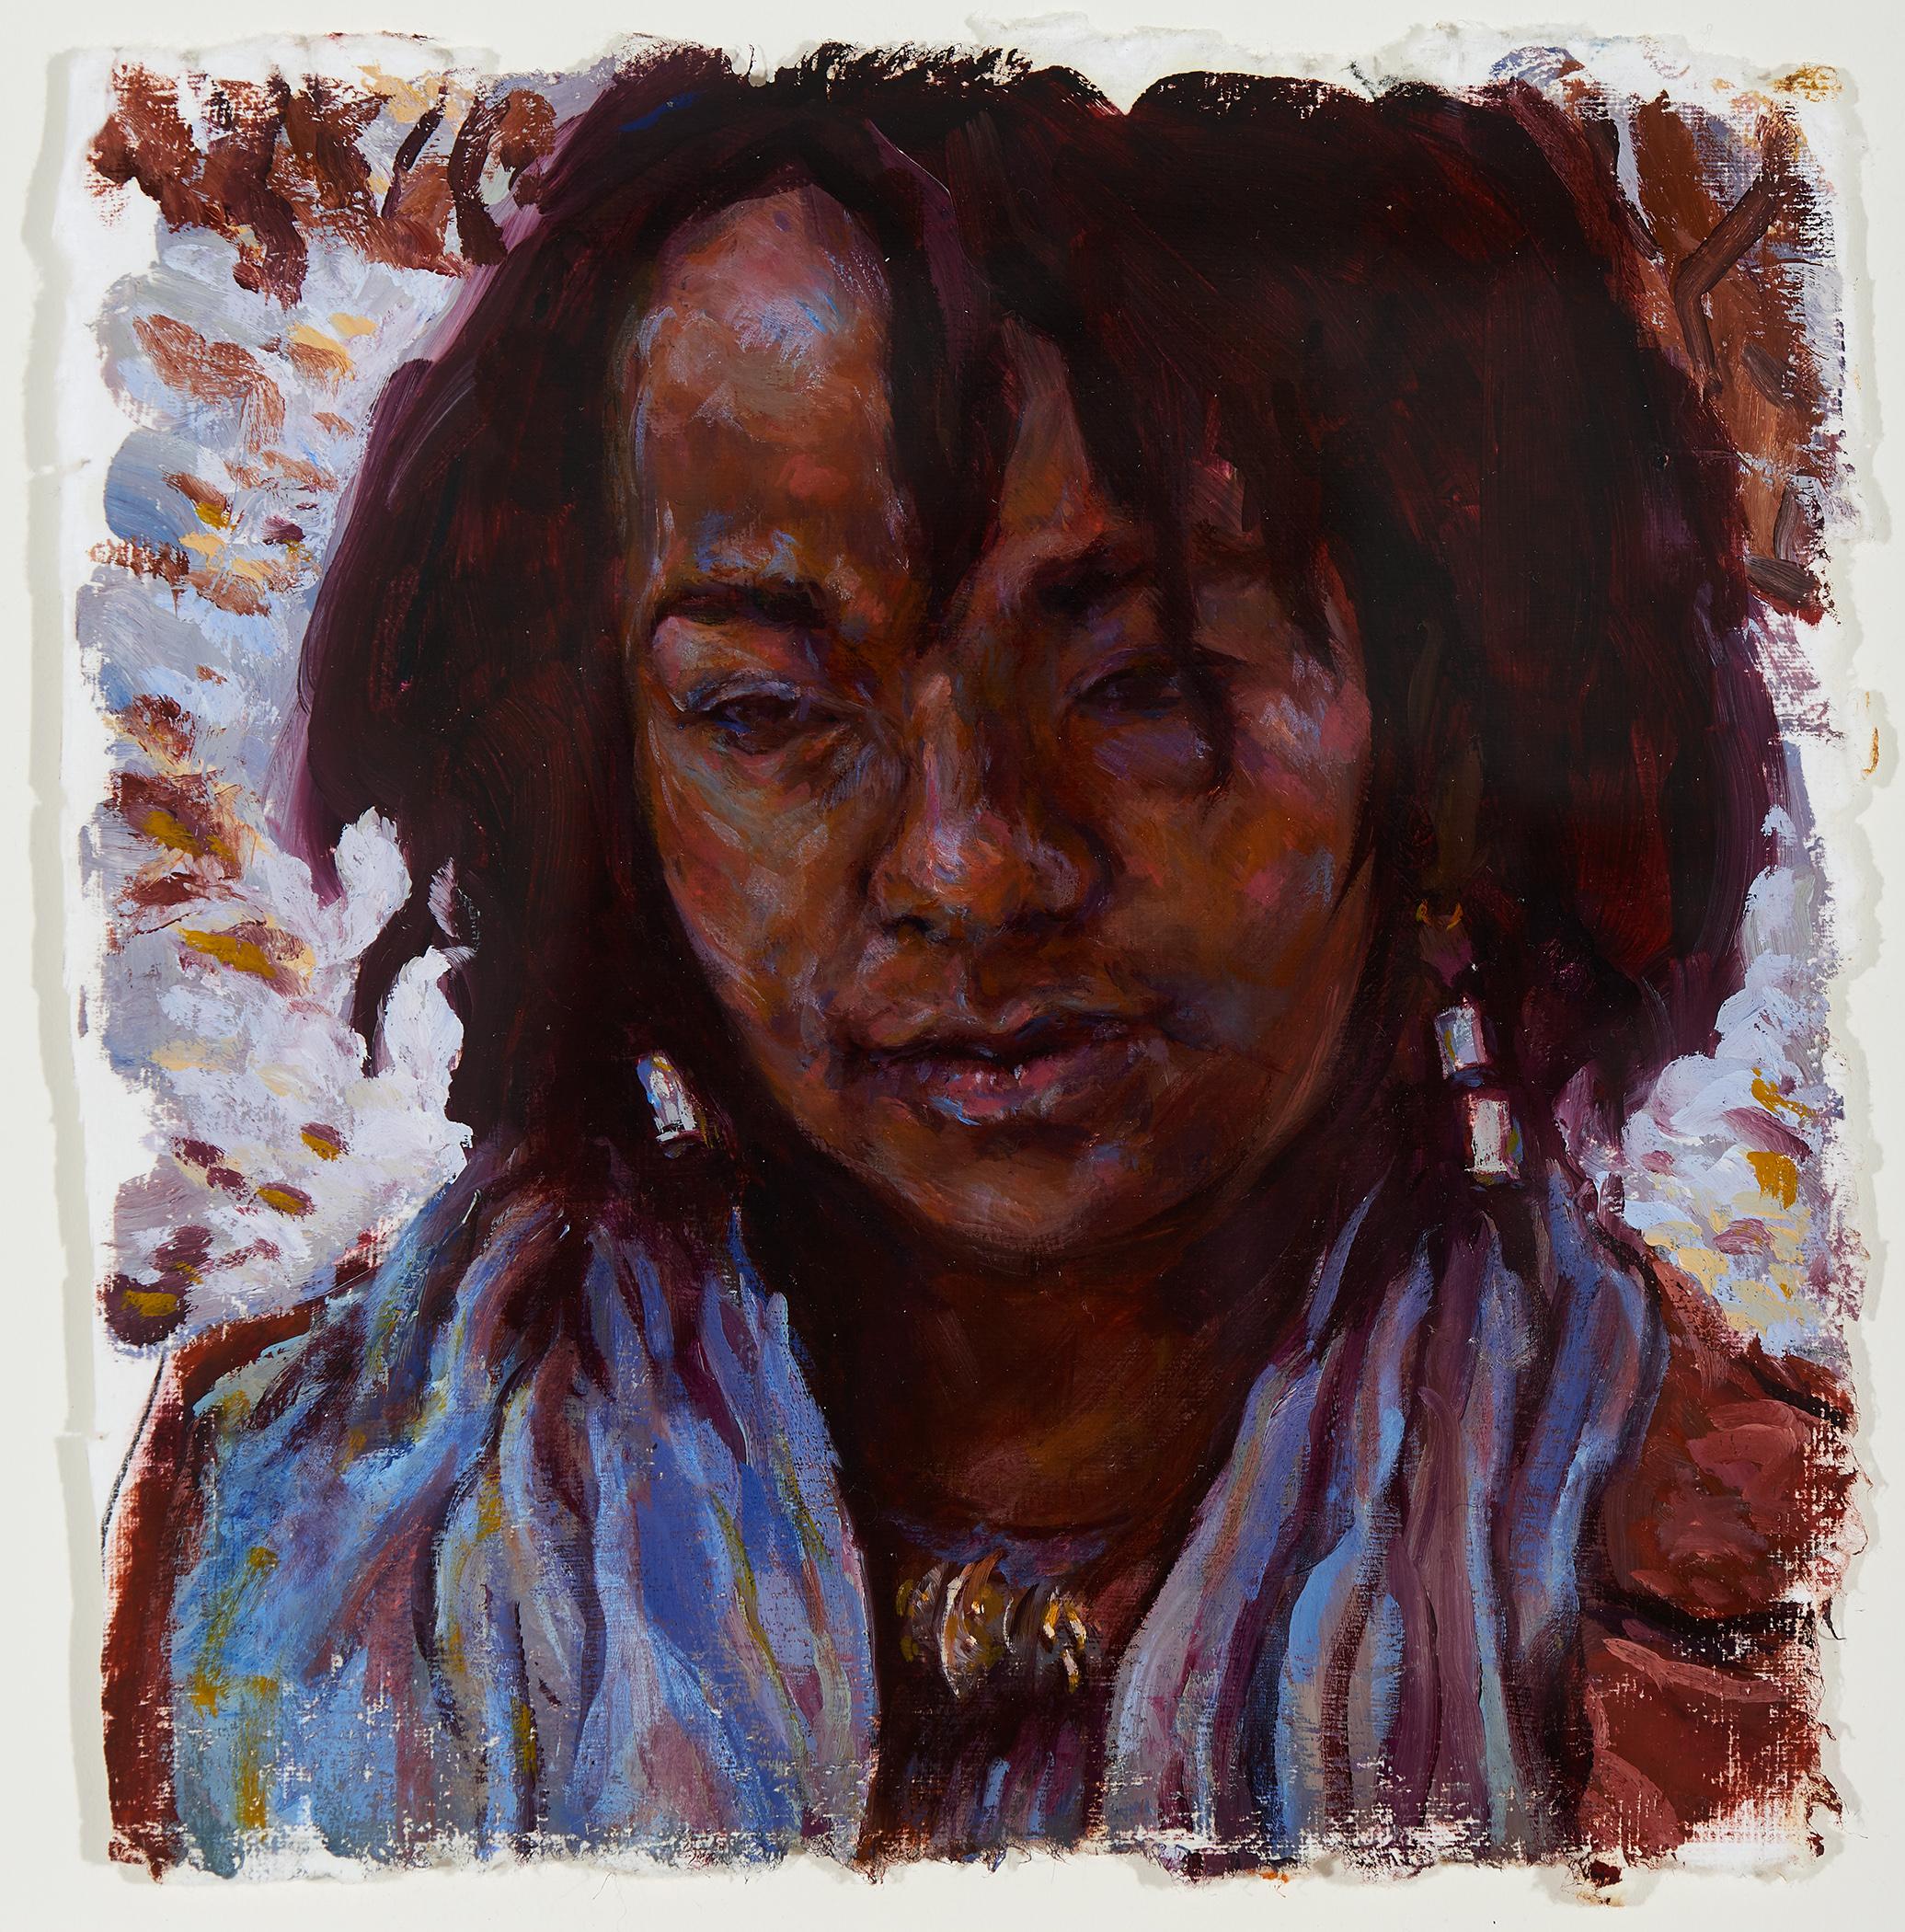 Portrait of Jameela  2019, oil on paper, 8 x 8in.